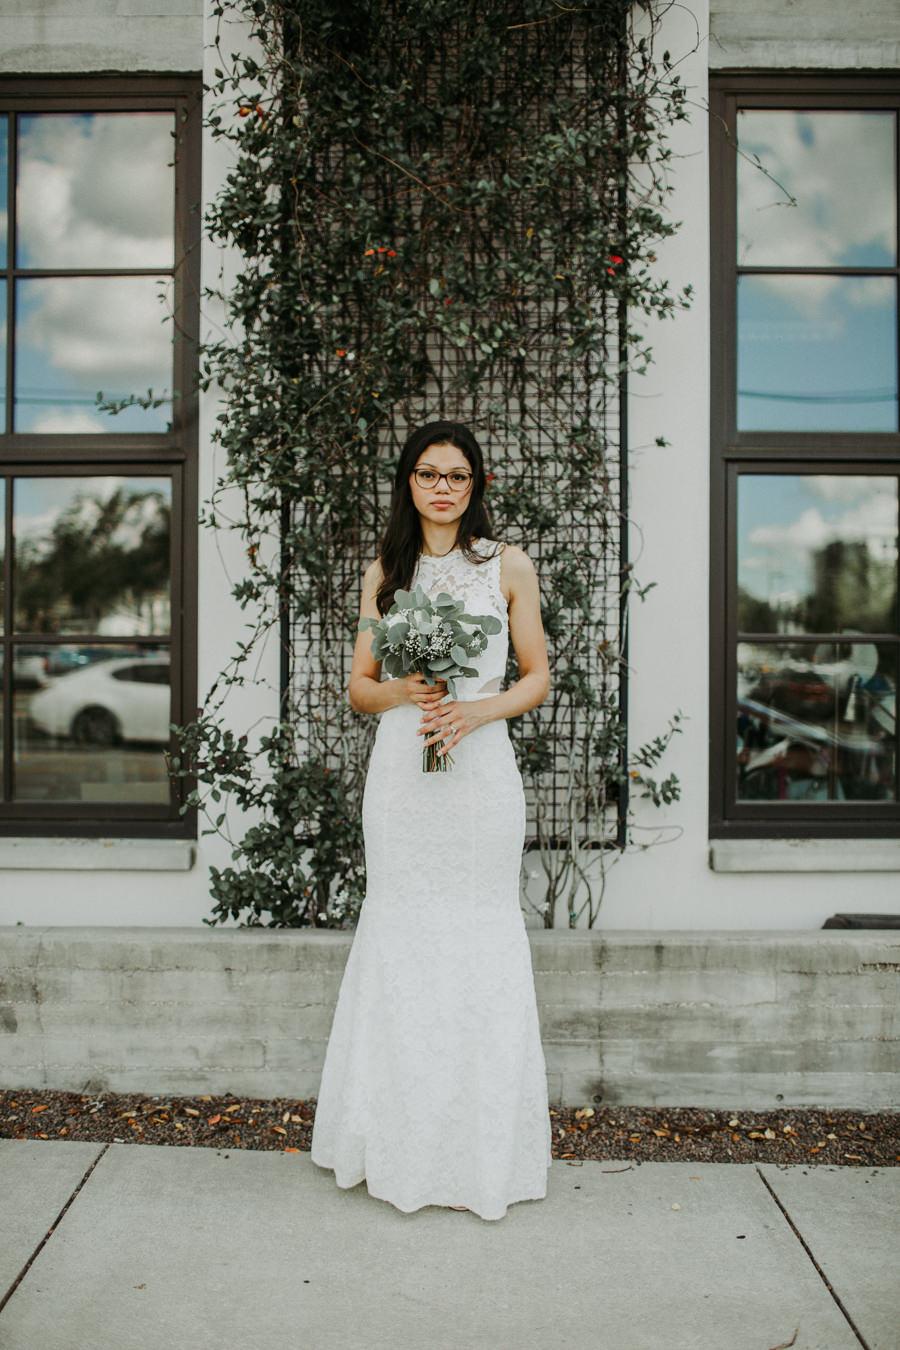 Tampa Heights Industrial Wedding at Cavu Emmy RJ-115.jpg